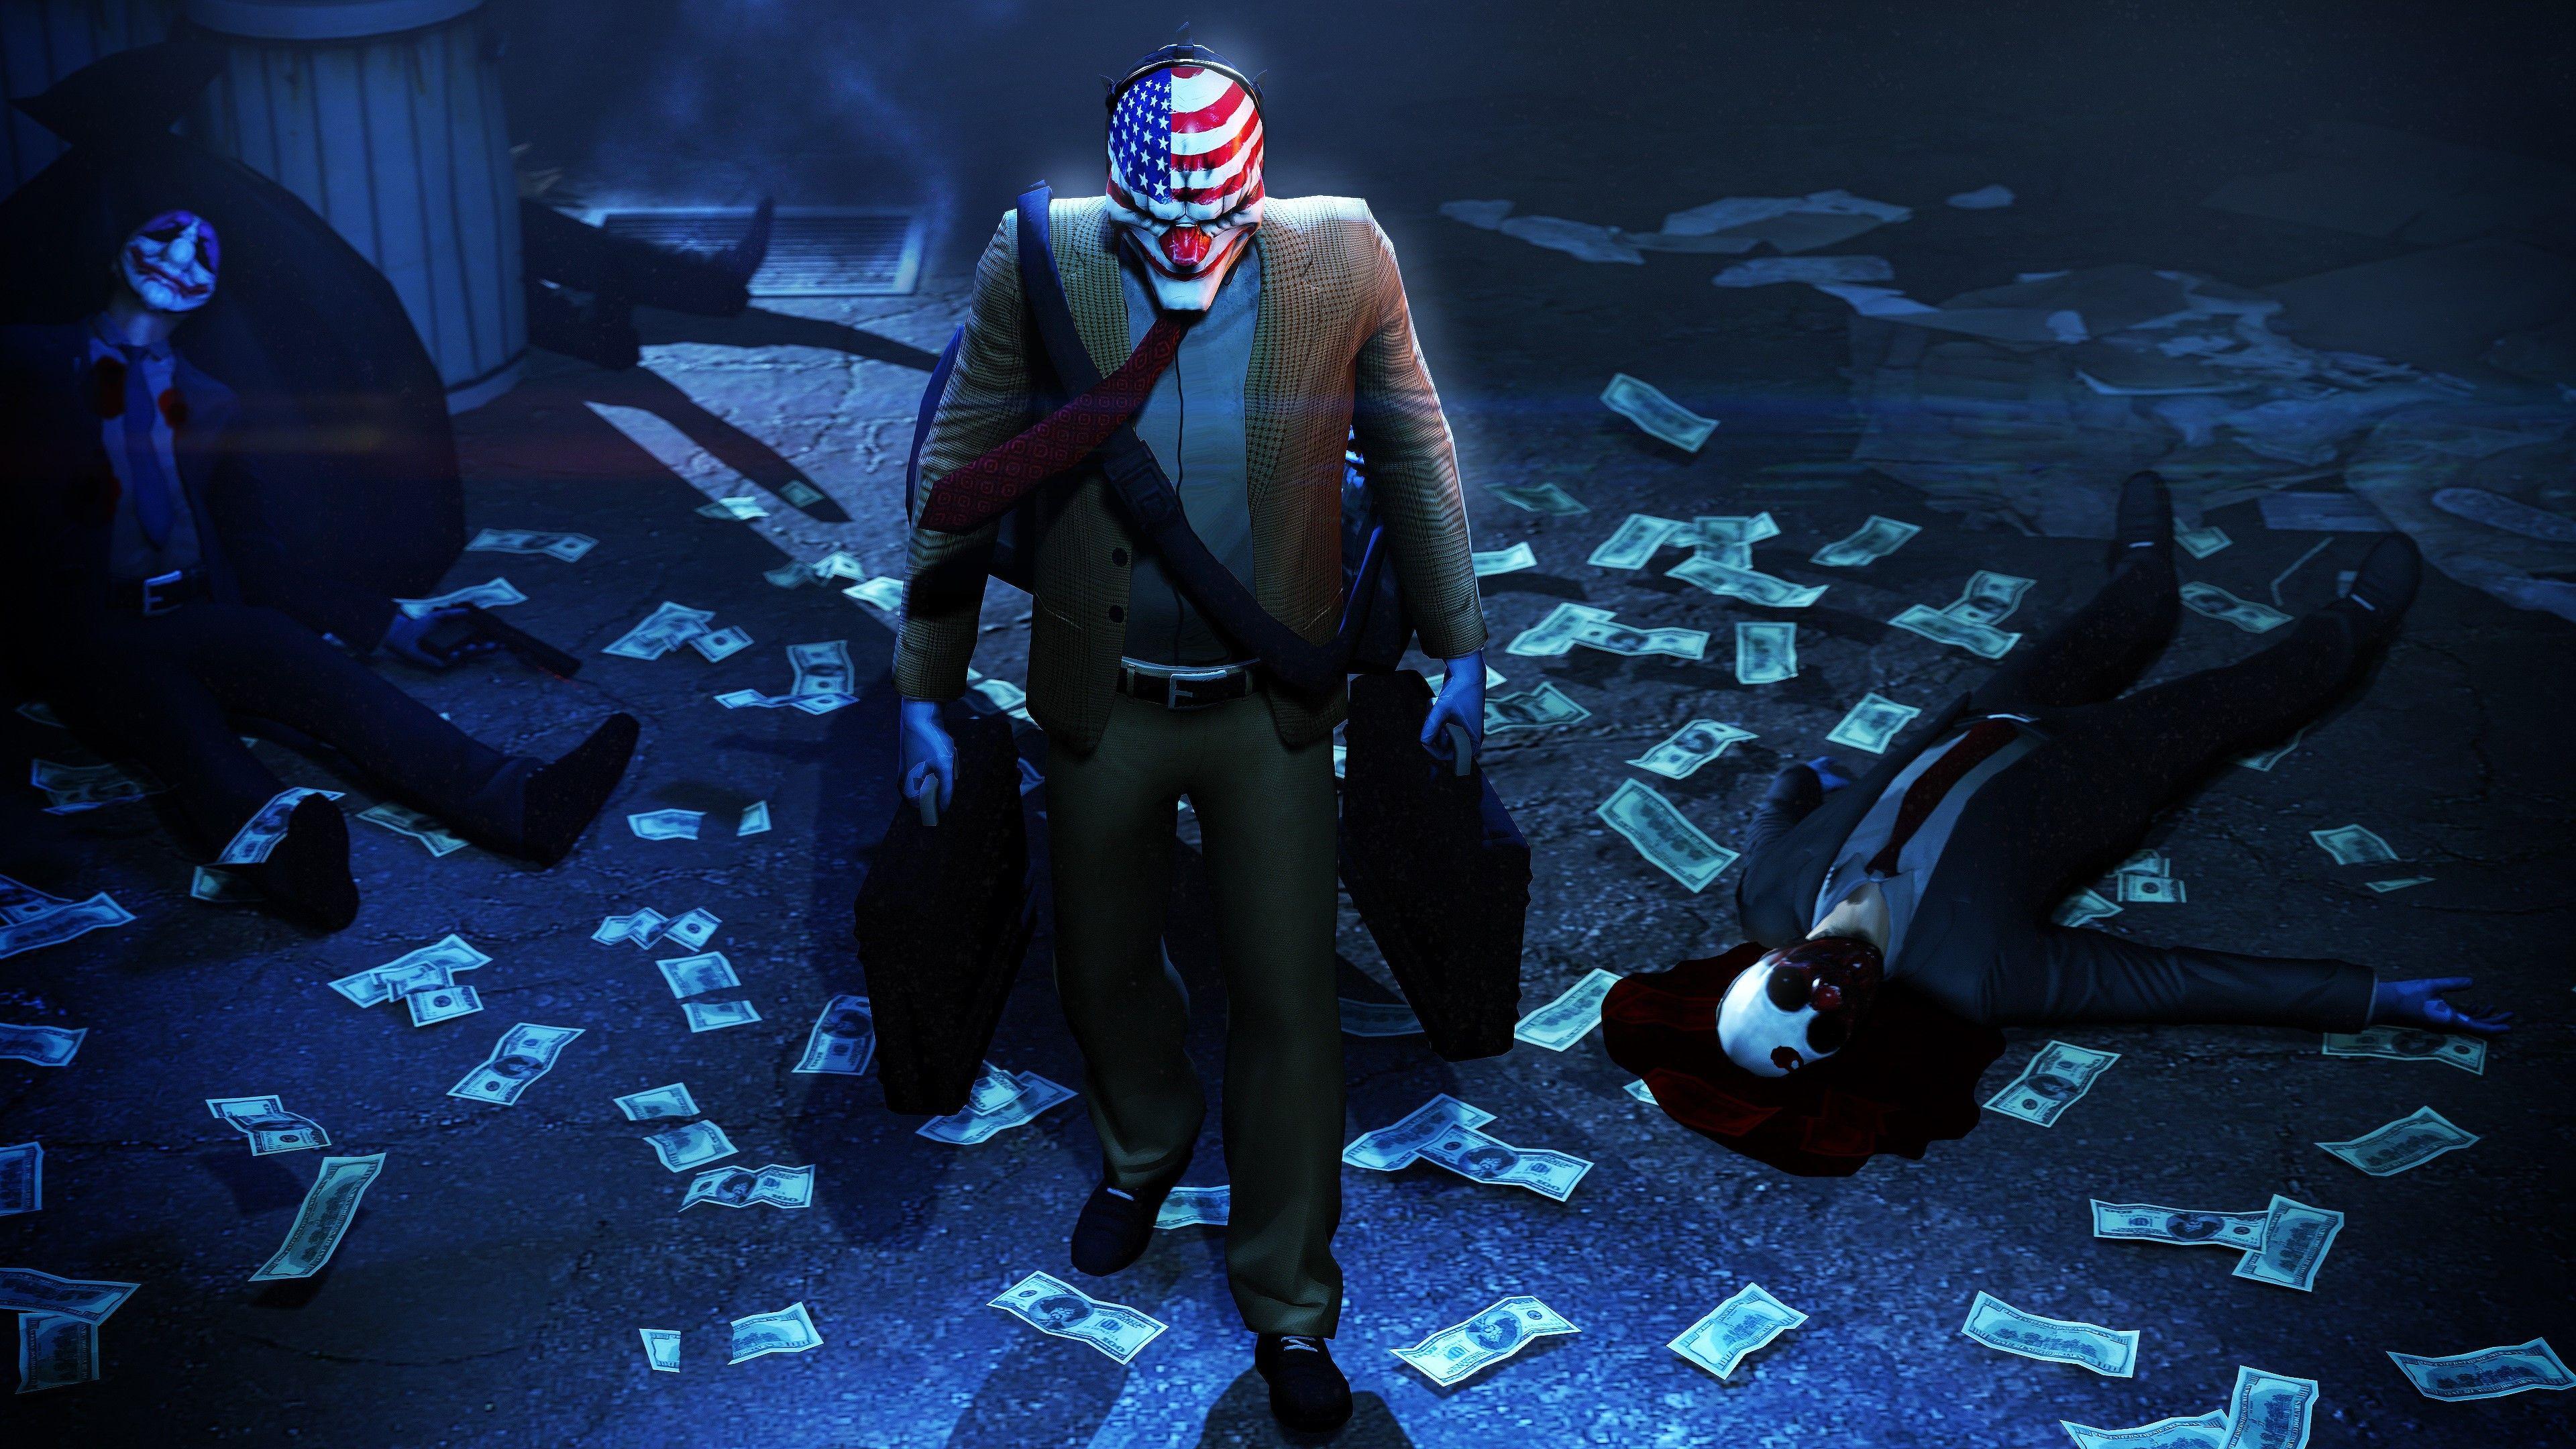 Watch Money Heist Hd Free Tv Show 3840x2160 Wallpaper Free Tv